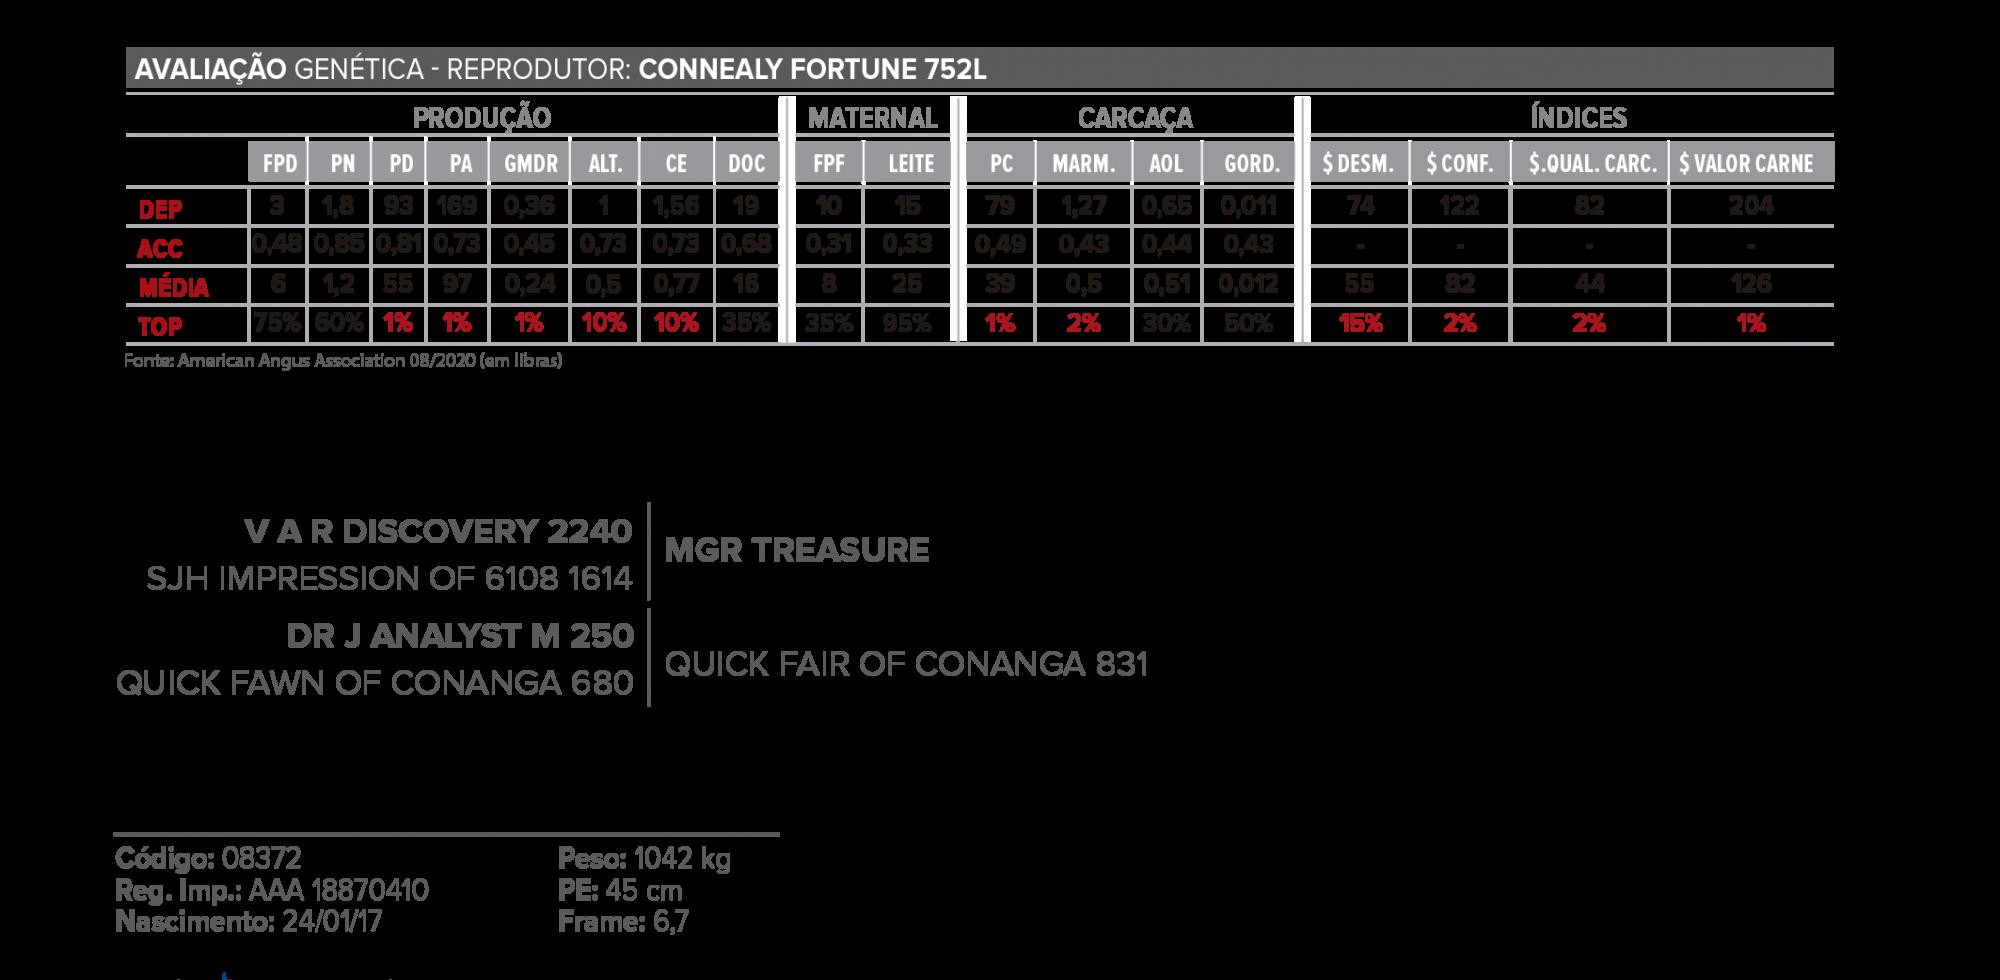 CONNEALY FORTUNE - Aberdeen Angus  - CRV Brasil